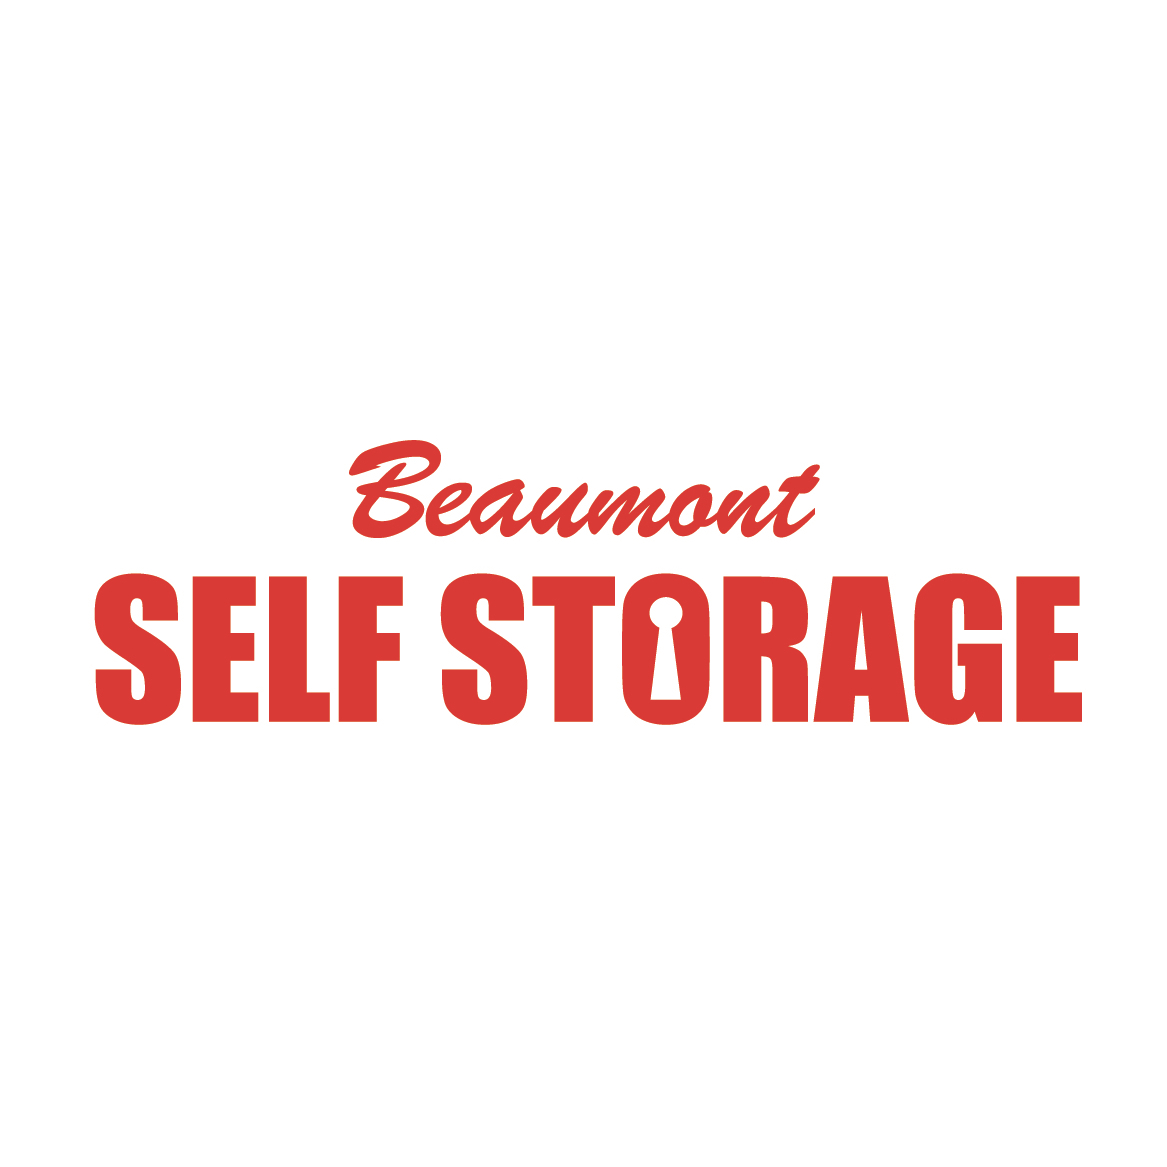 Beaumont Self Storage